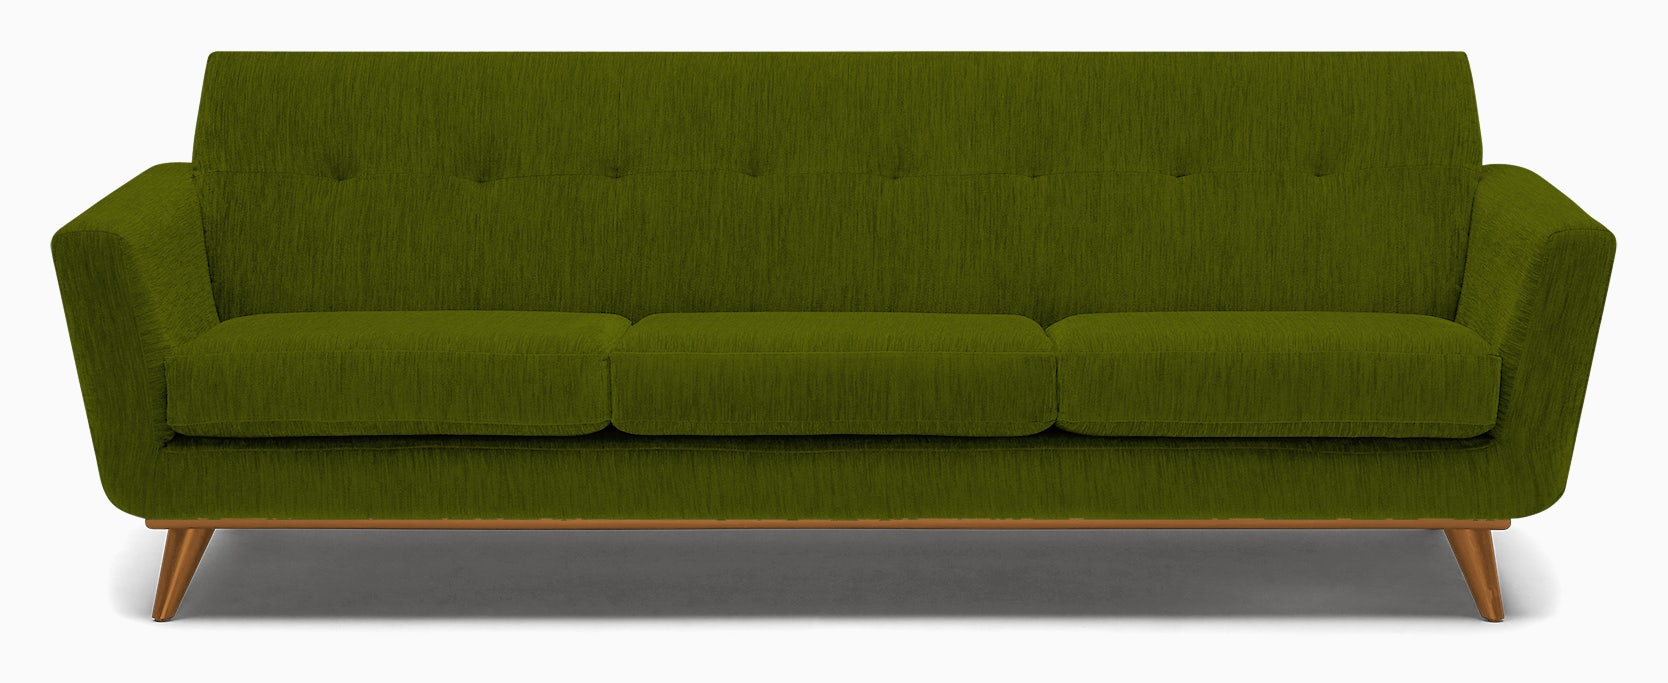 hughes grand sofa royale apple